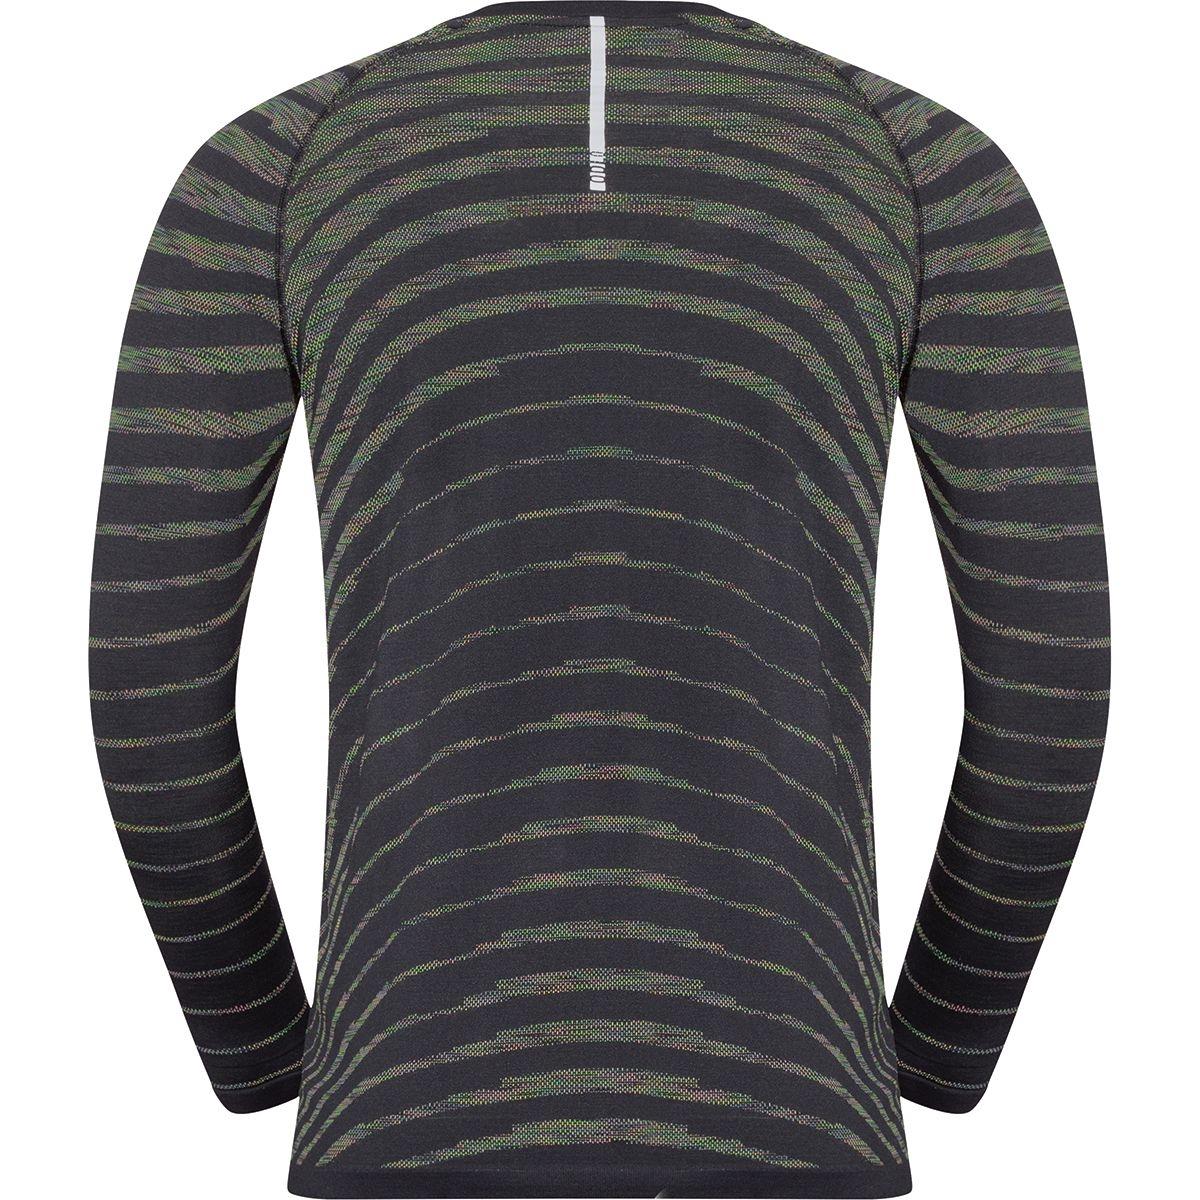 Odlo Herren BLACKCOMB PRO Langarm-Shirt 313182 black-space dye